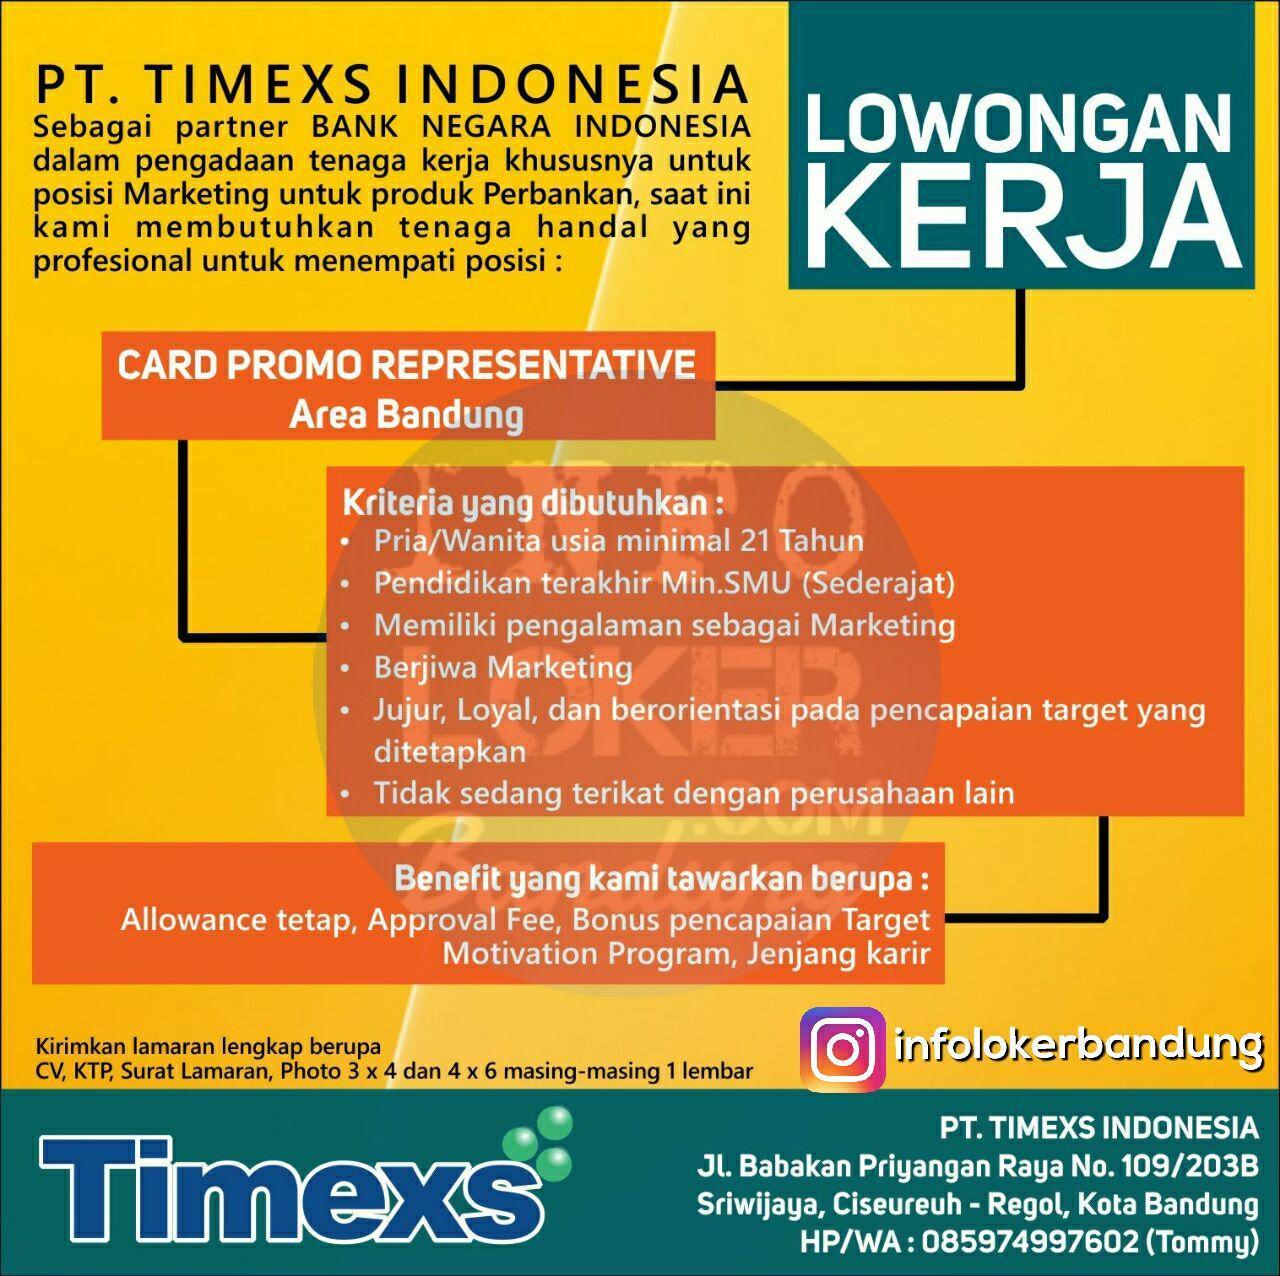 Lowongan Kerja PT. Timexs Indonesia Oktober 2017